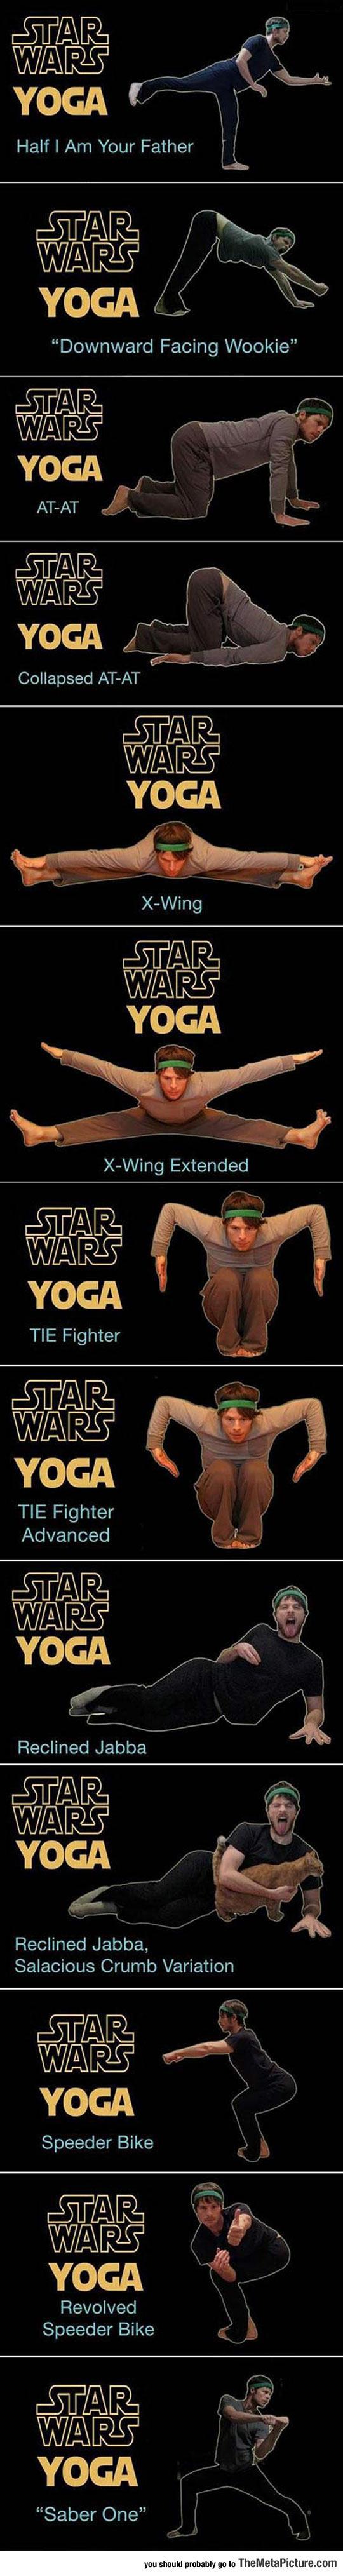 cool-yoga-class-Star-Wars